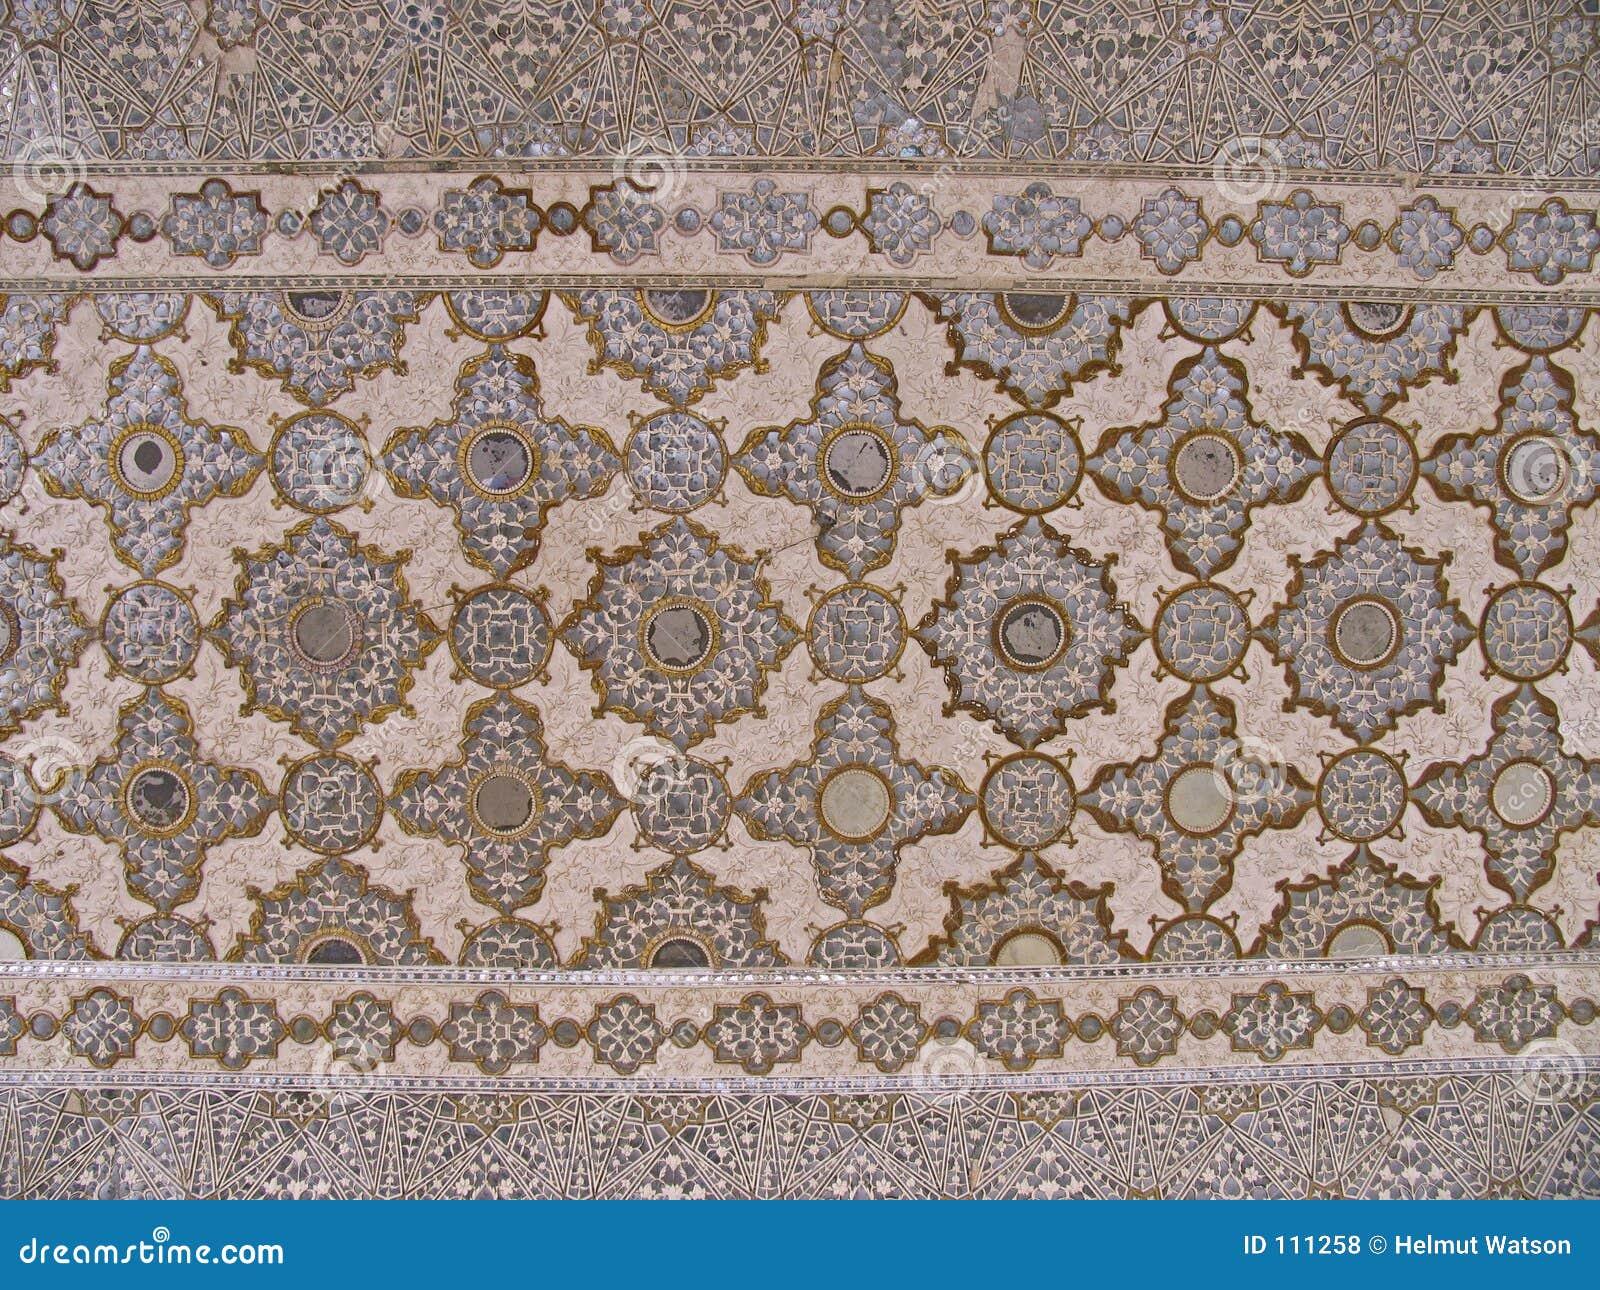 India - teto decorado